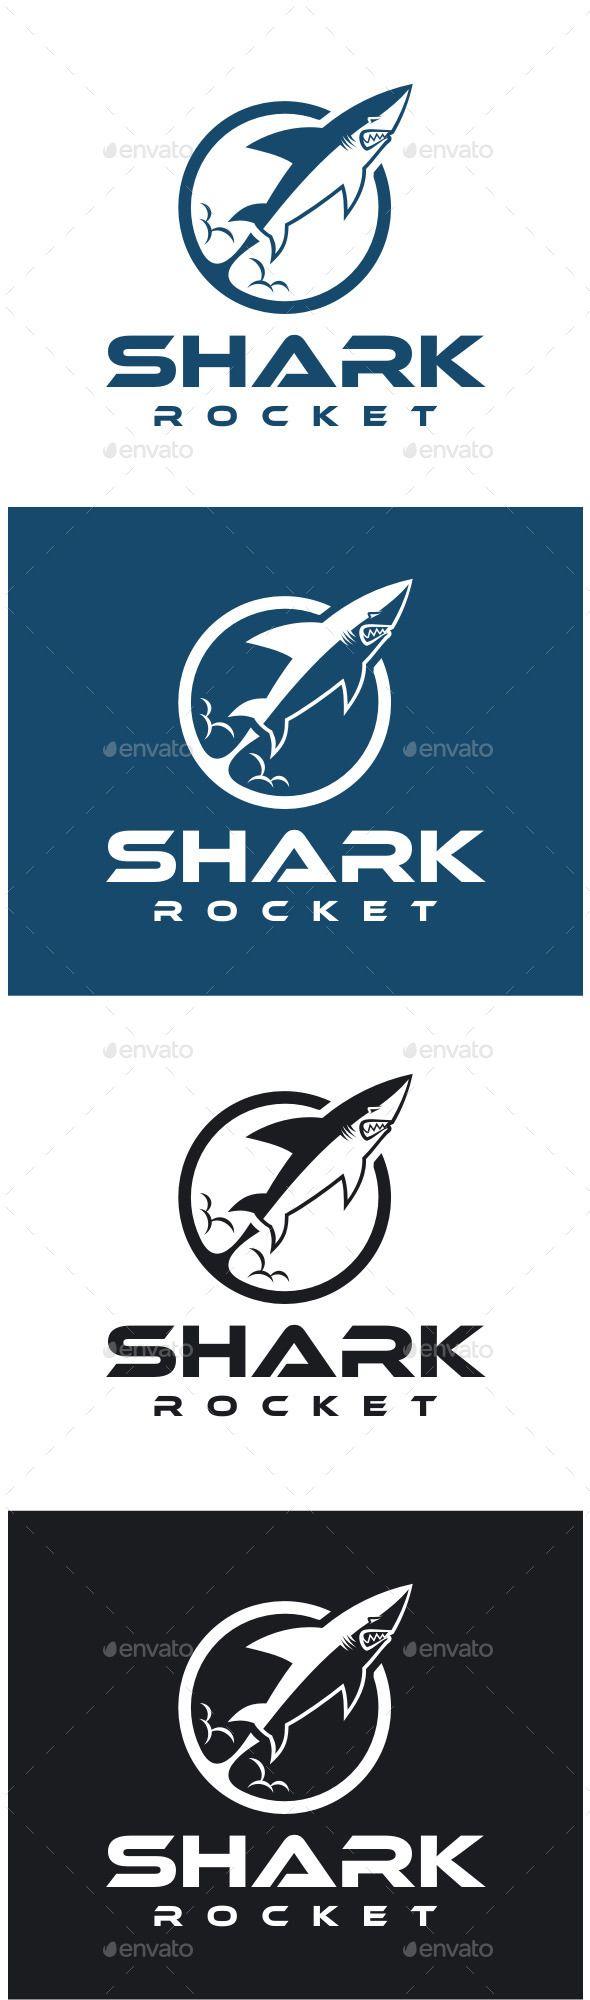 Shark Rocket Logo — Vector EPS #fin #predator • Available here → https://graphicriver.net/item/shark-rocket-logo/8813538?ref=pxcr